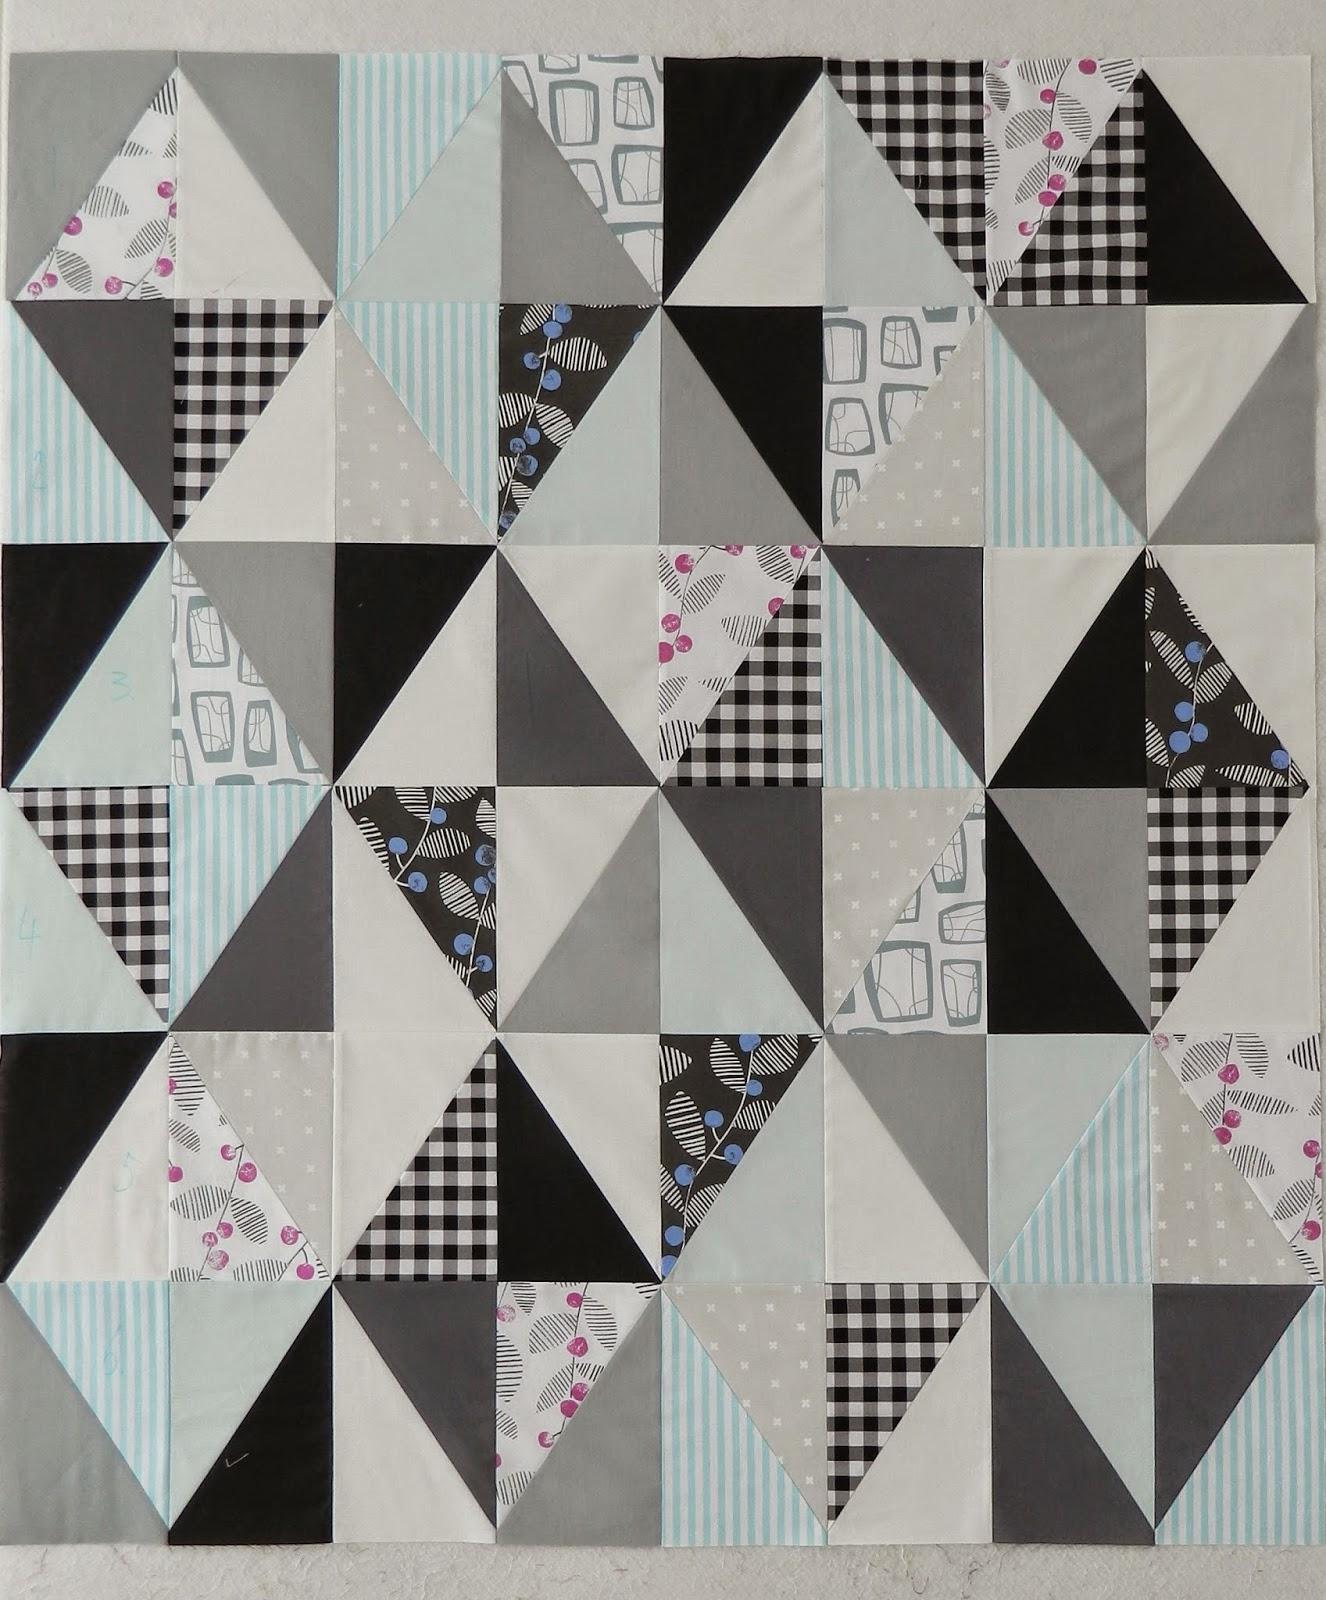 s.o.t.a.k handmade: half rectangle triangles